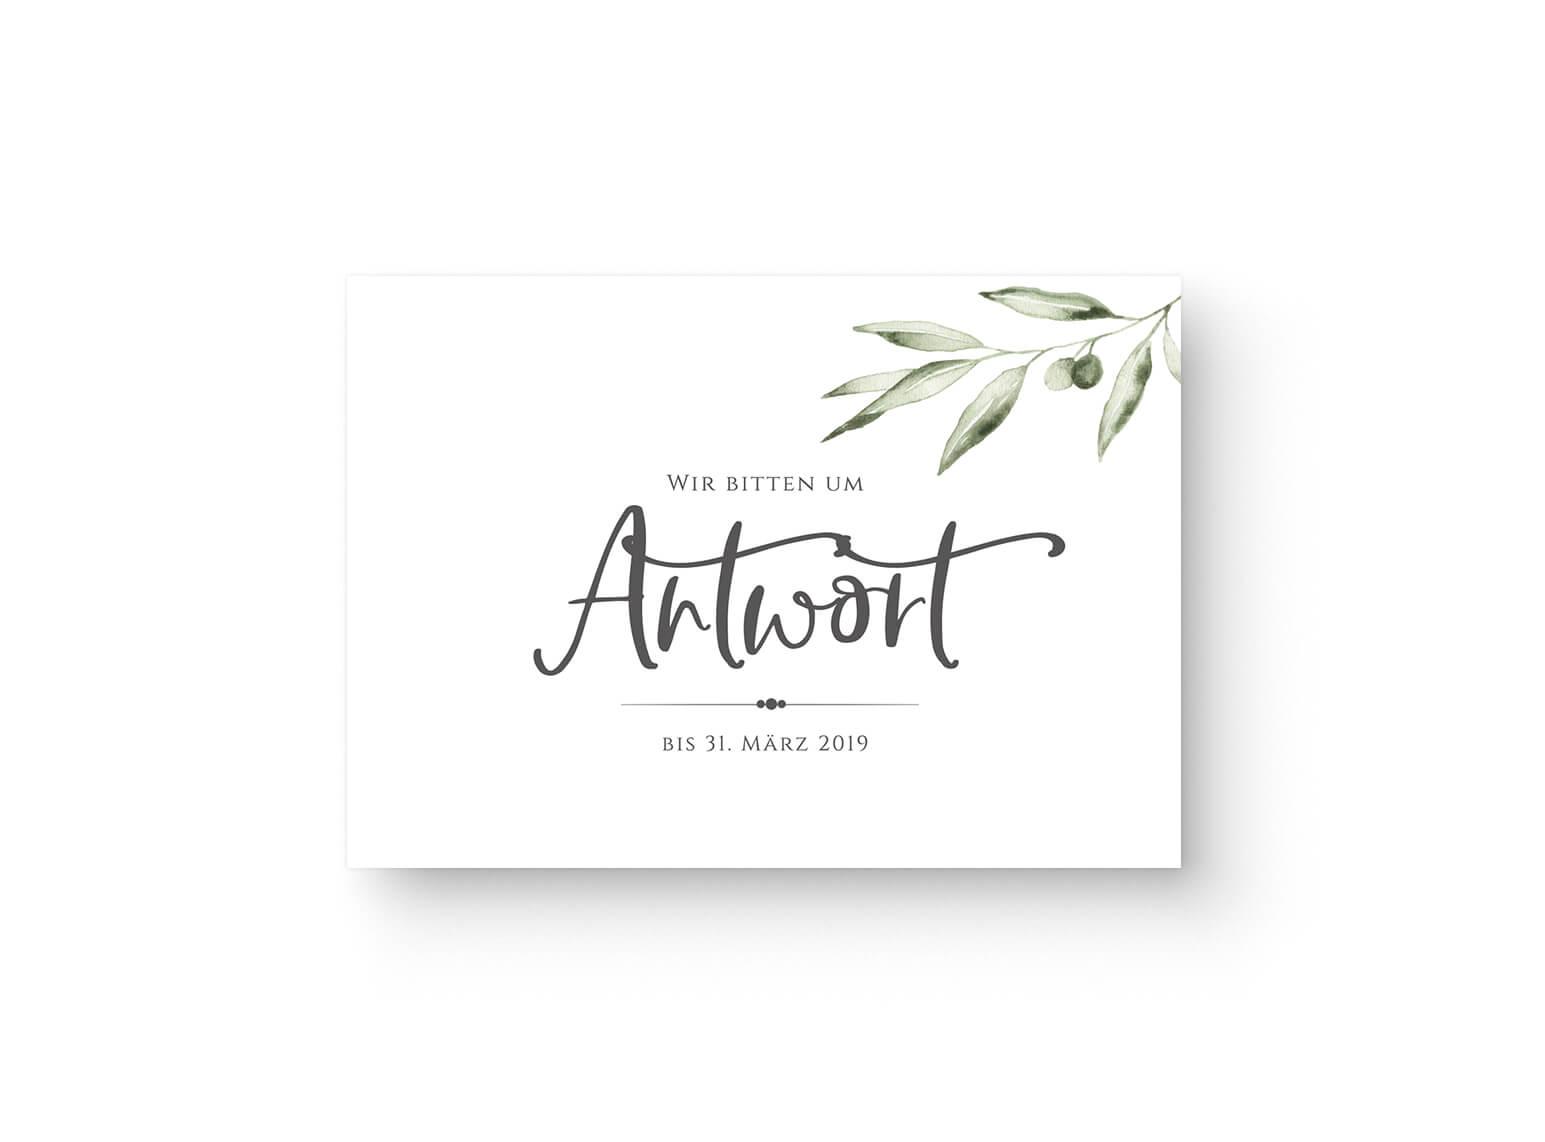 antwort-karte-rueckmeldung-postkarte-olive-zweig-aquarell-gruen-grau-front_MP0008-1.0.2